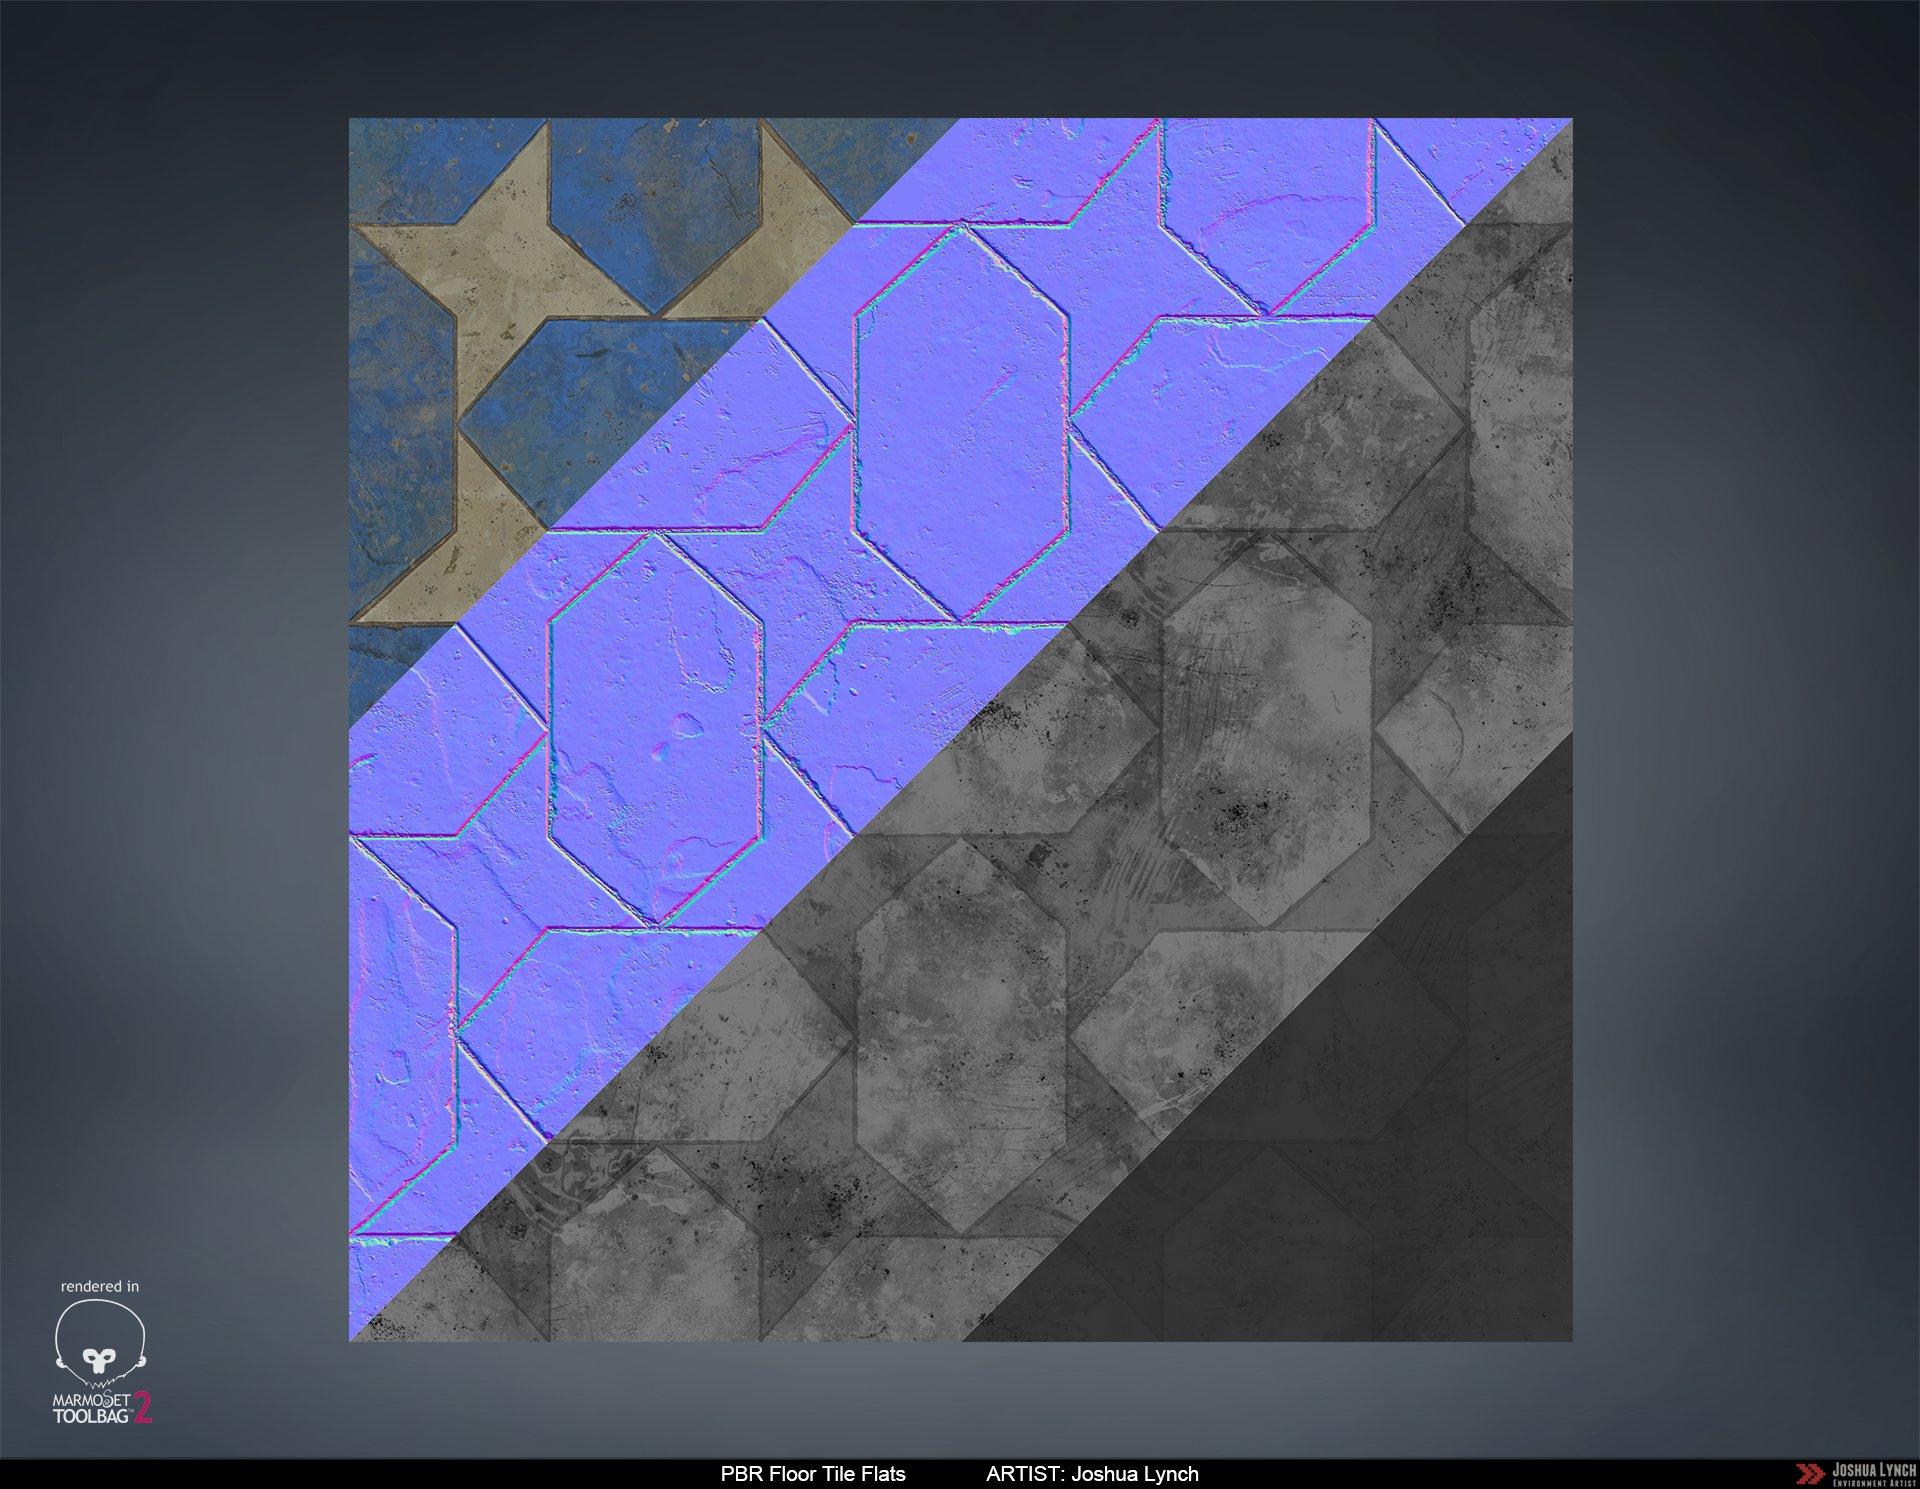 Joshua lynch floor stone tile flats layout comp josh lynch